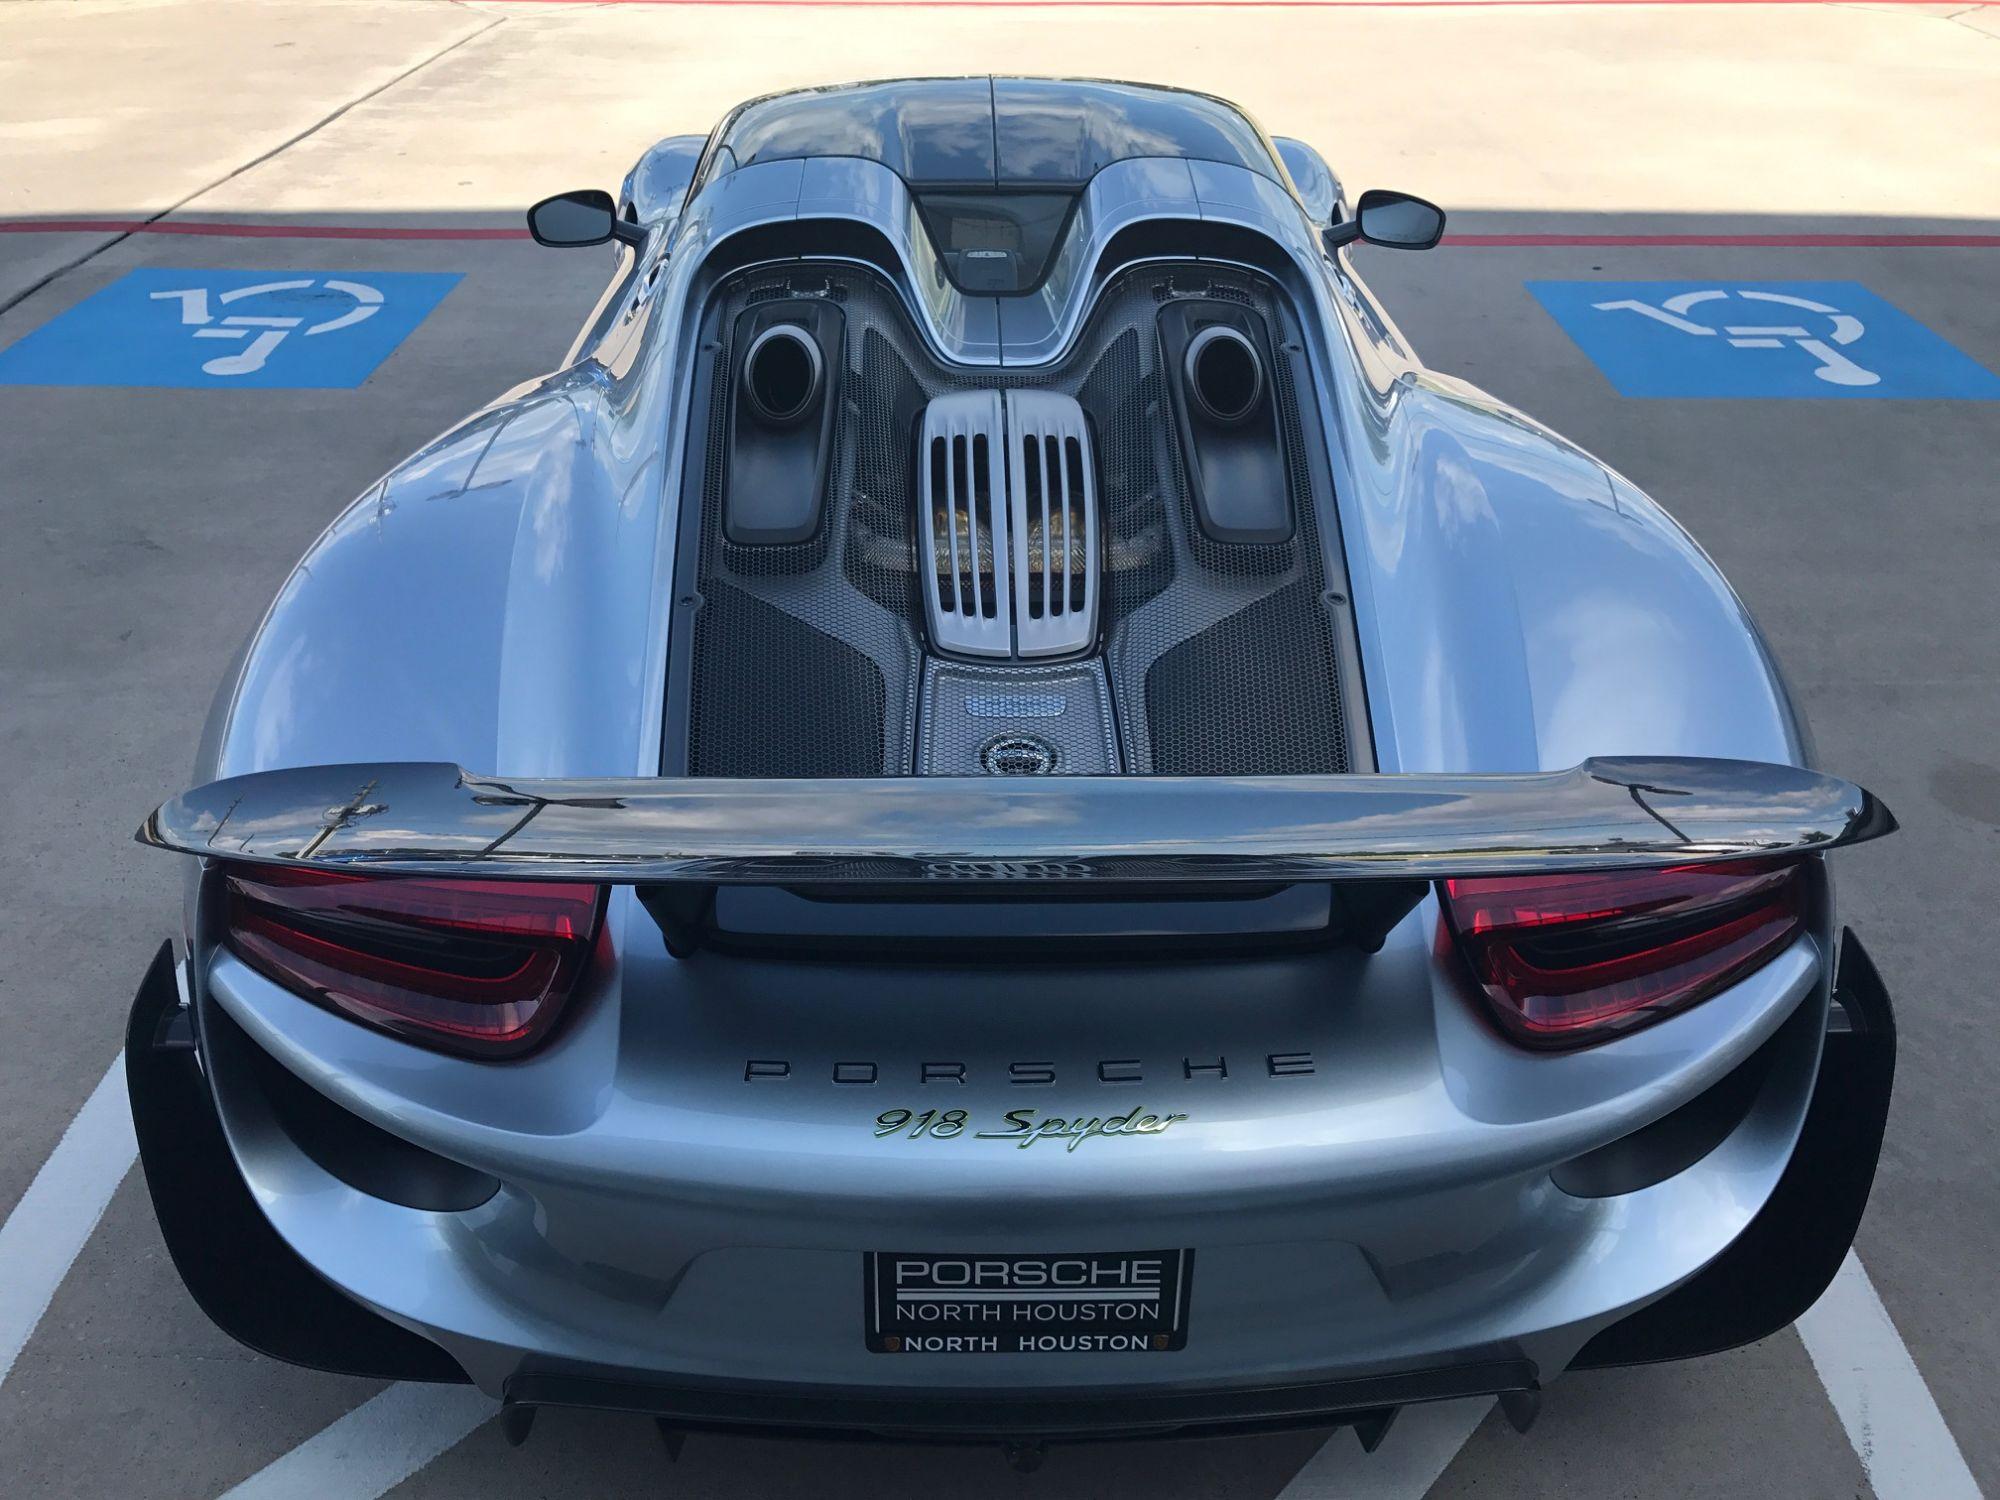 message-editor%2F1497472880454-img_9718_7b12865a635ae2ce9b80a960d18aa46336503ac8 Fascinating Porsche 918 Spyder Fiyat Listesi Cars Trend